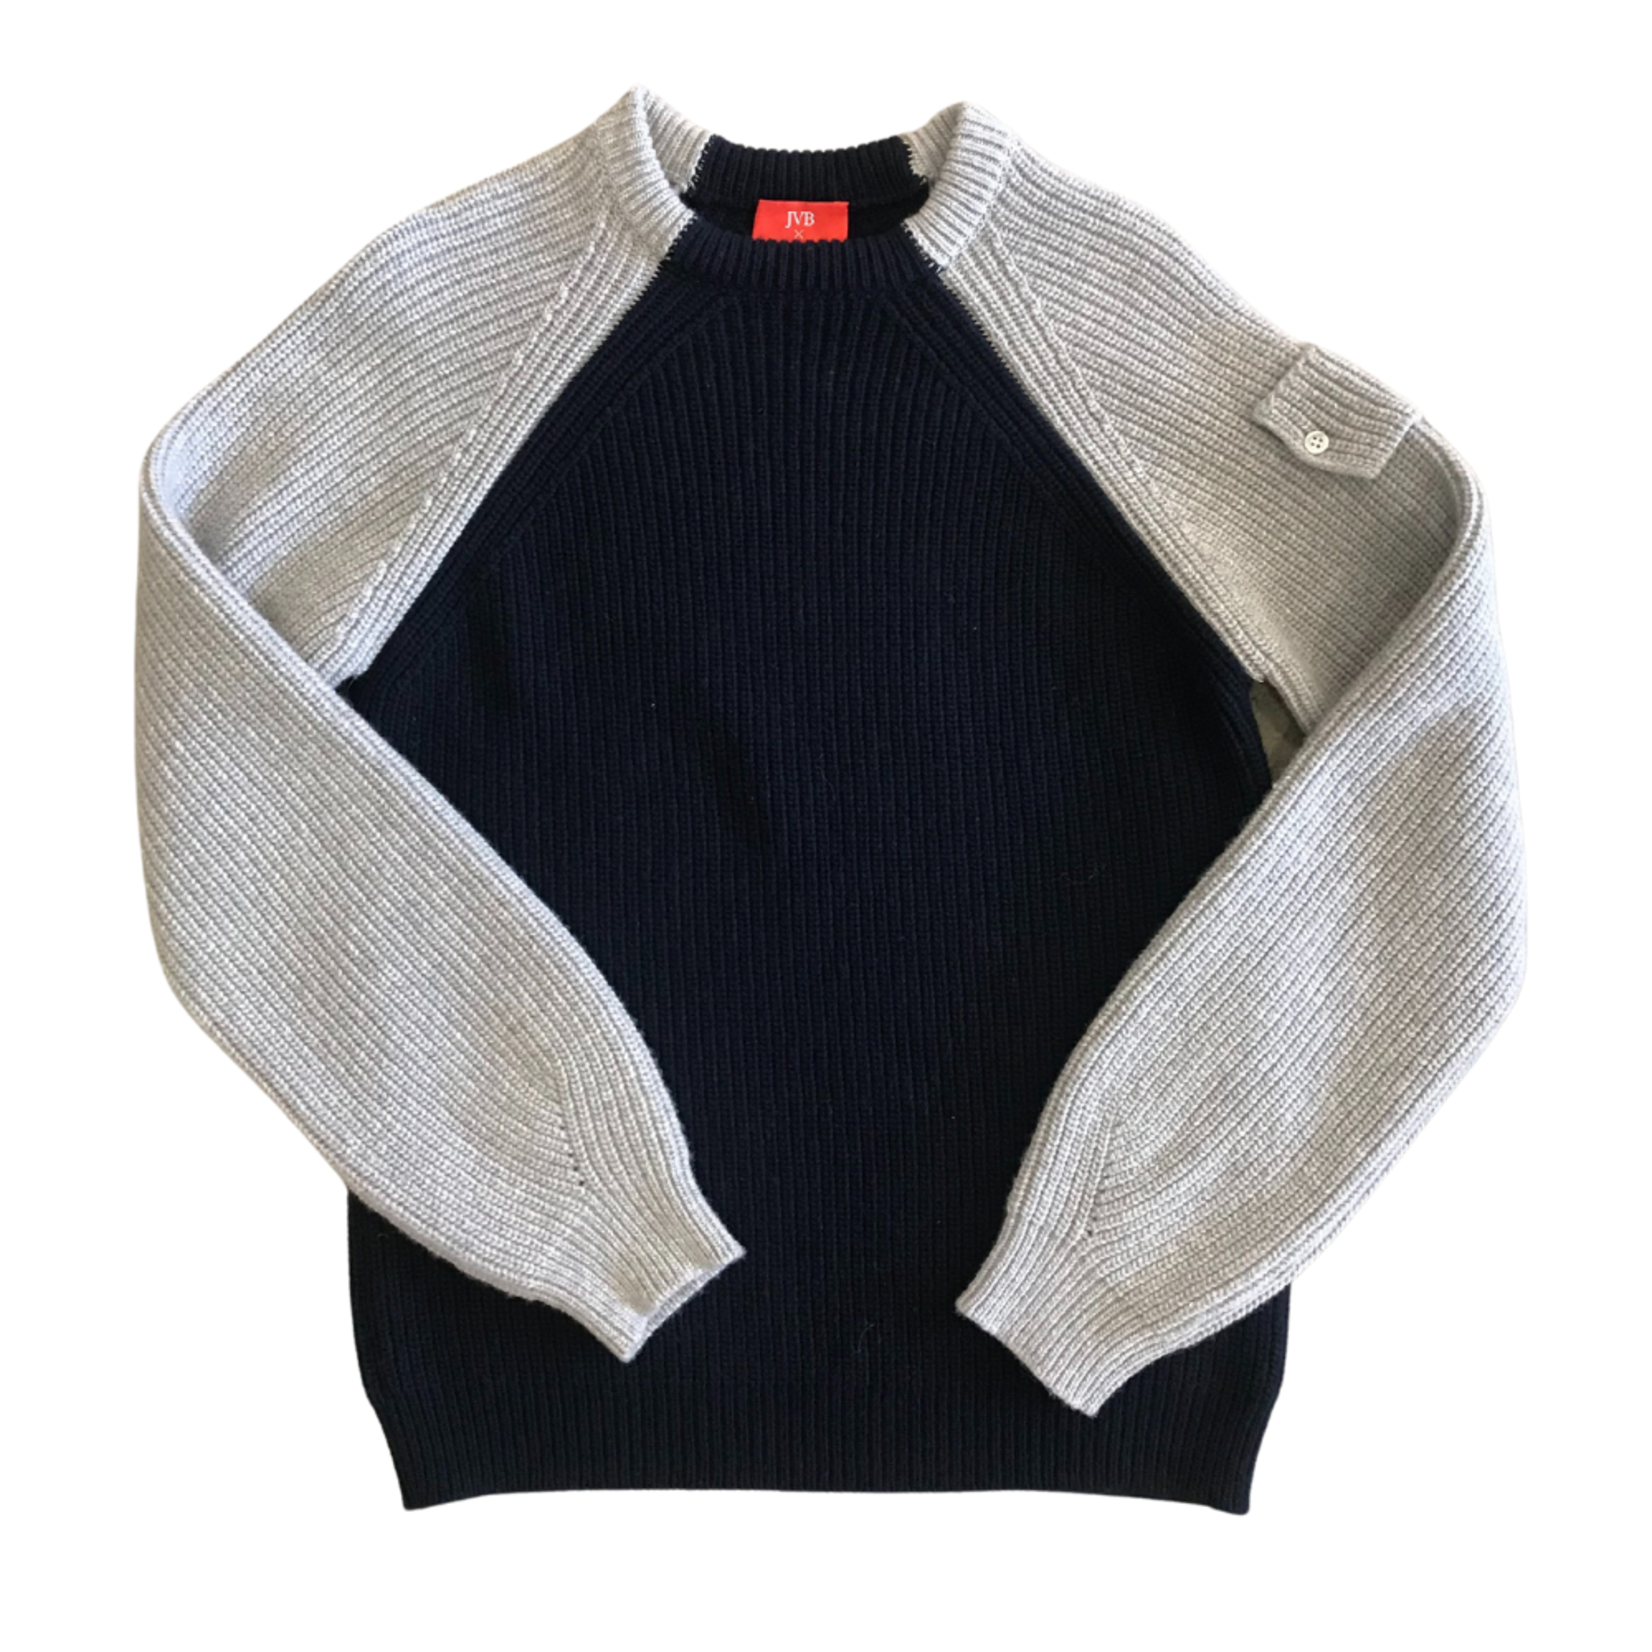 GoodLife JVB Colorblock Sweater